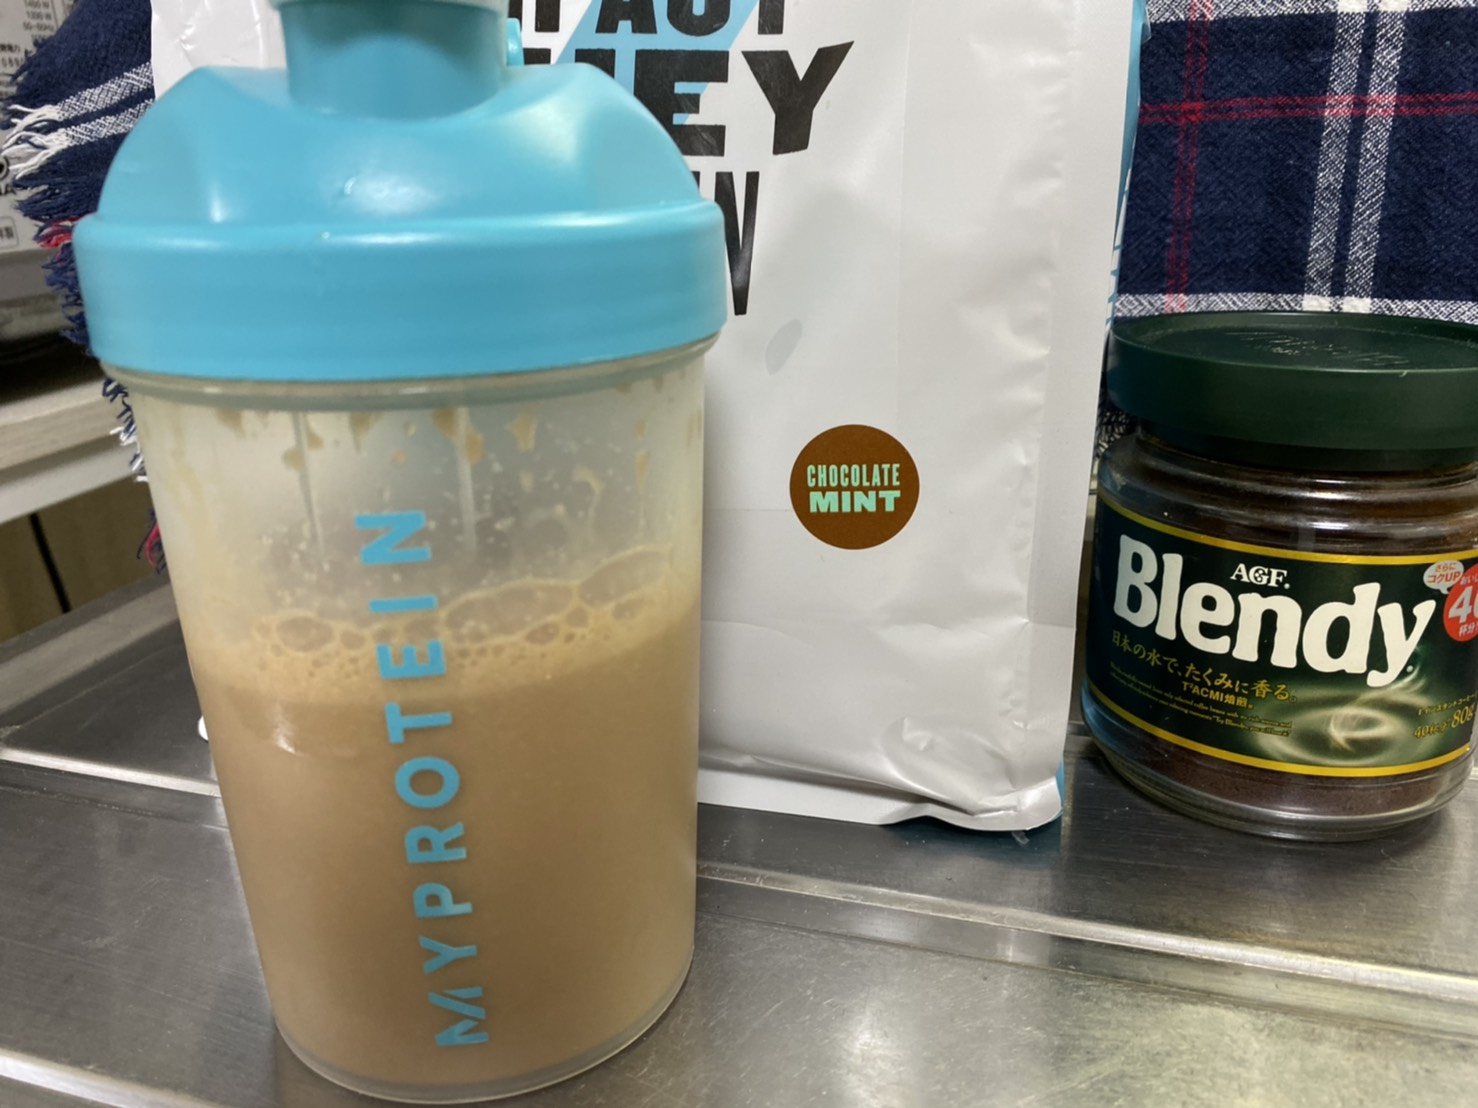 Impactホエイプロテイン:チョコミント味をインスタントコーヒーで割る